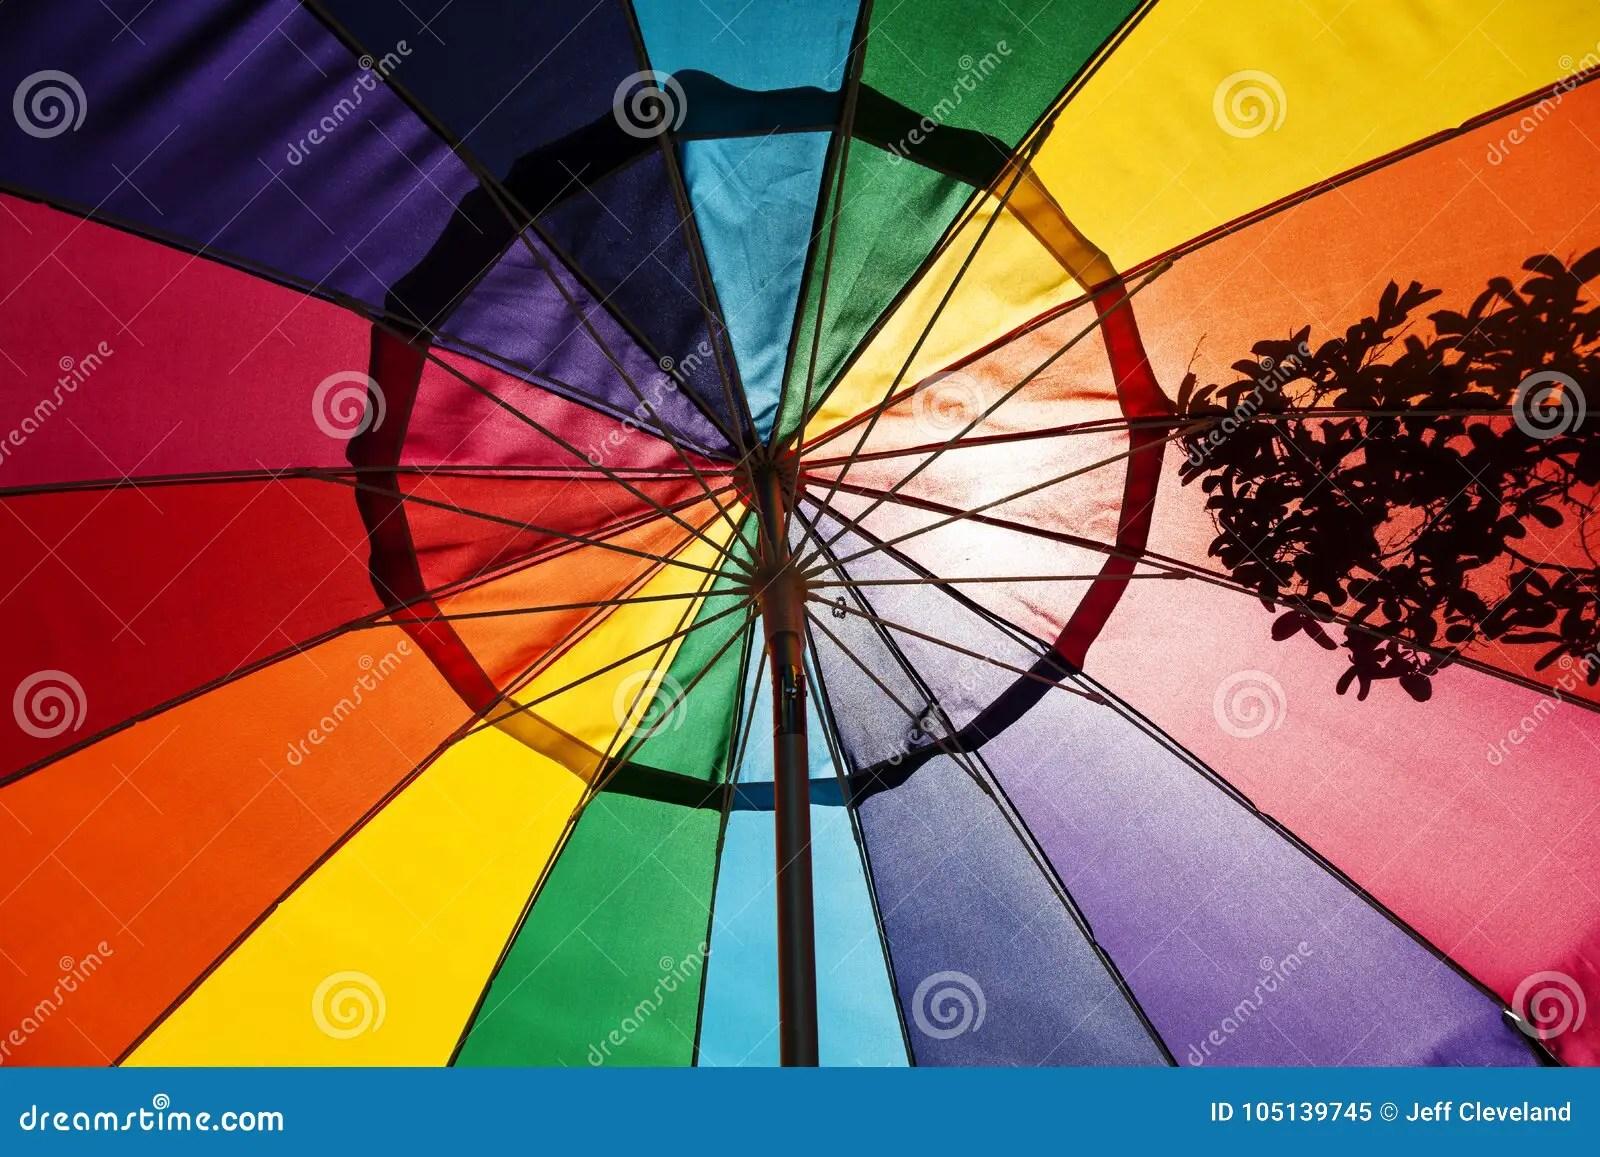 https www dreamstime com sunlight shining multi colored patio umbrella looking up sunlight hitting rainbow colored patio umbrella image105139745